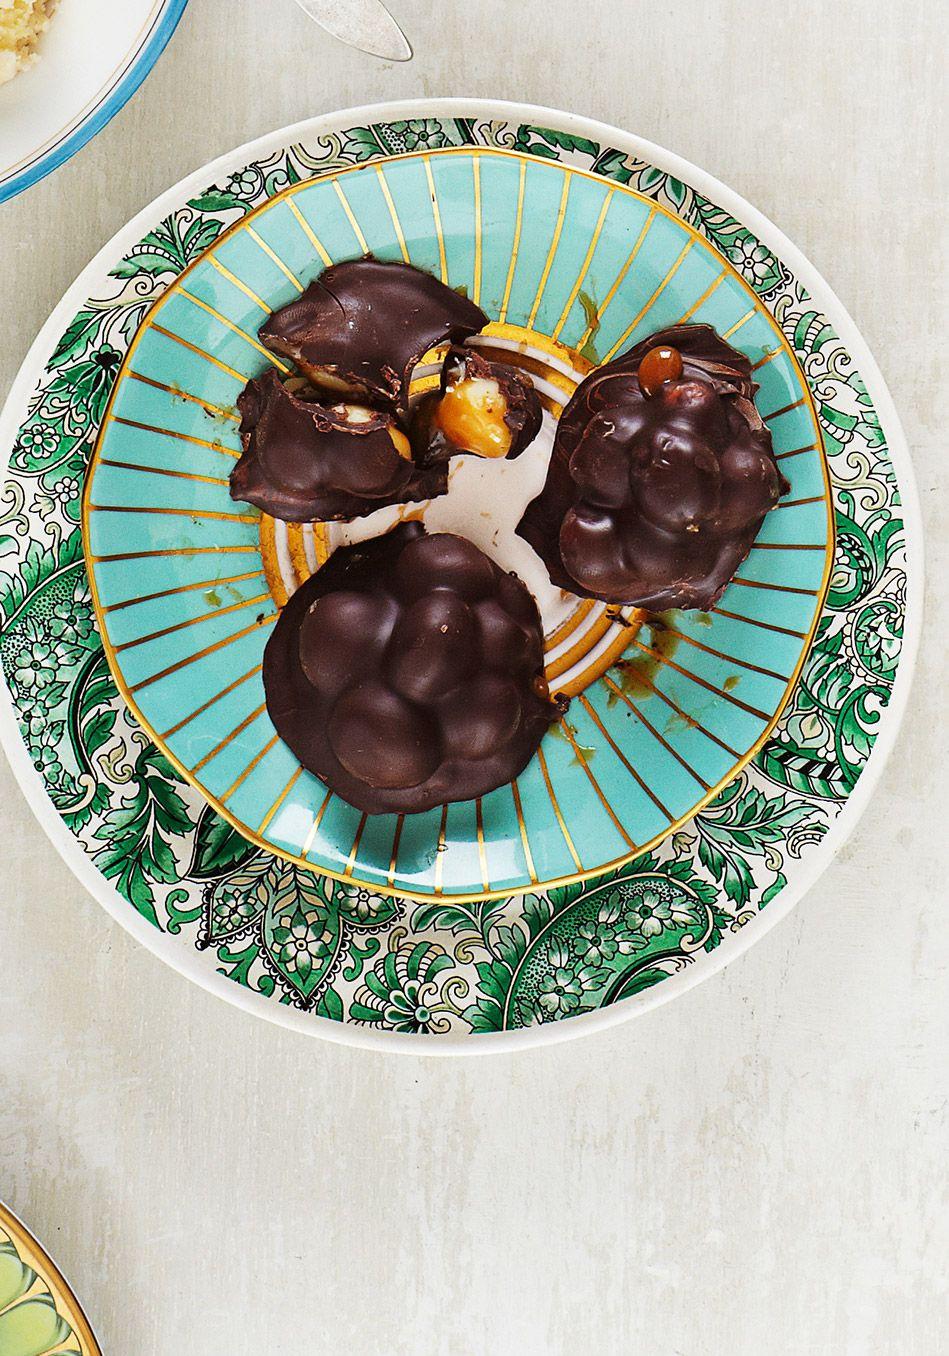 Chocolate-Caramel Macadamia Clusters Recipe - sprinkle sea salt before topping hardens.